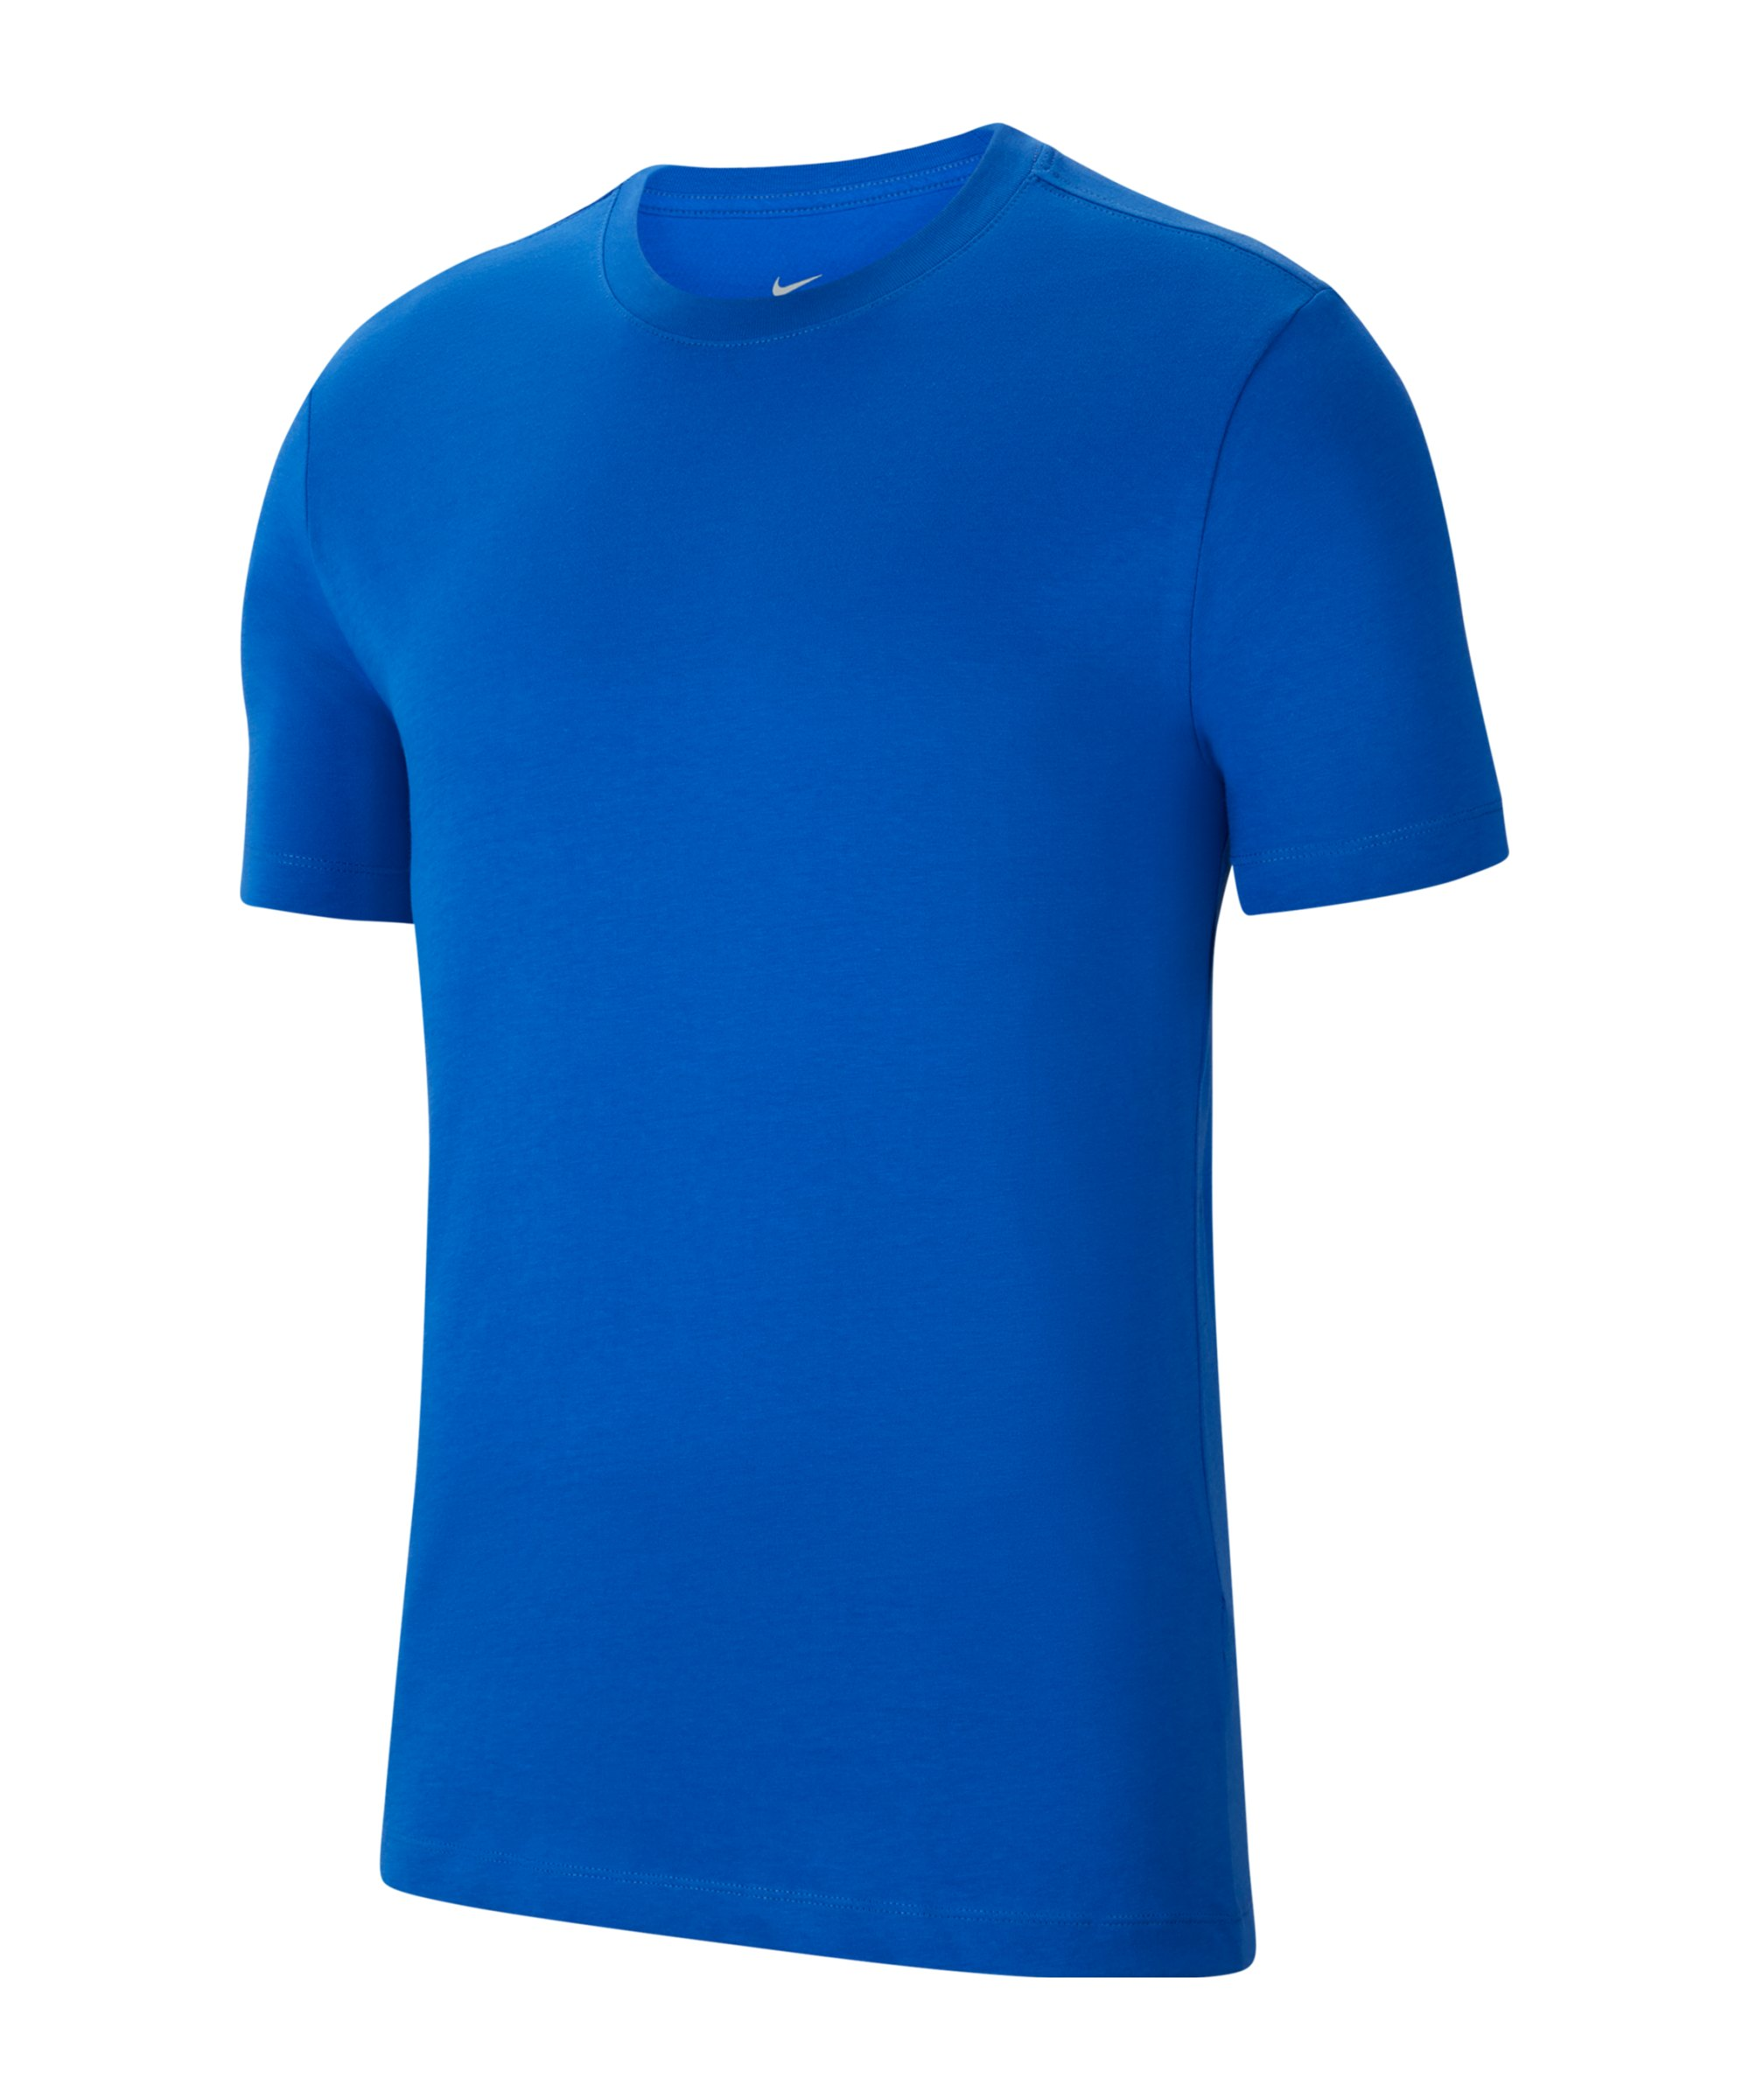 Nike Park 20 T-Shirt Kids Blau Weiss F463 - blau